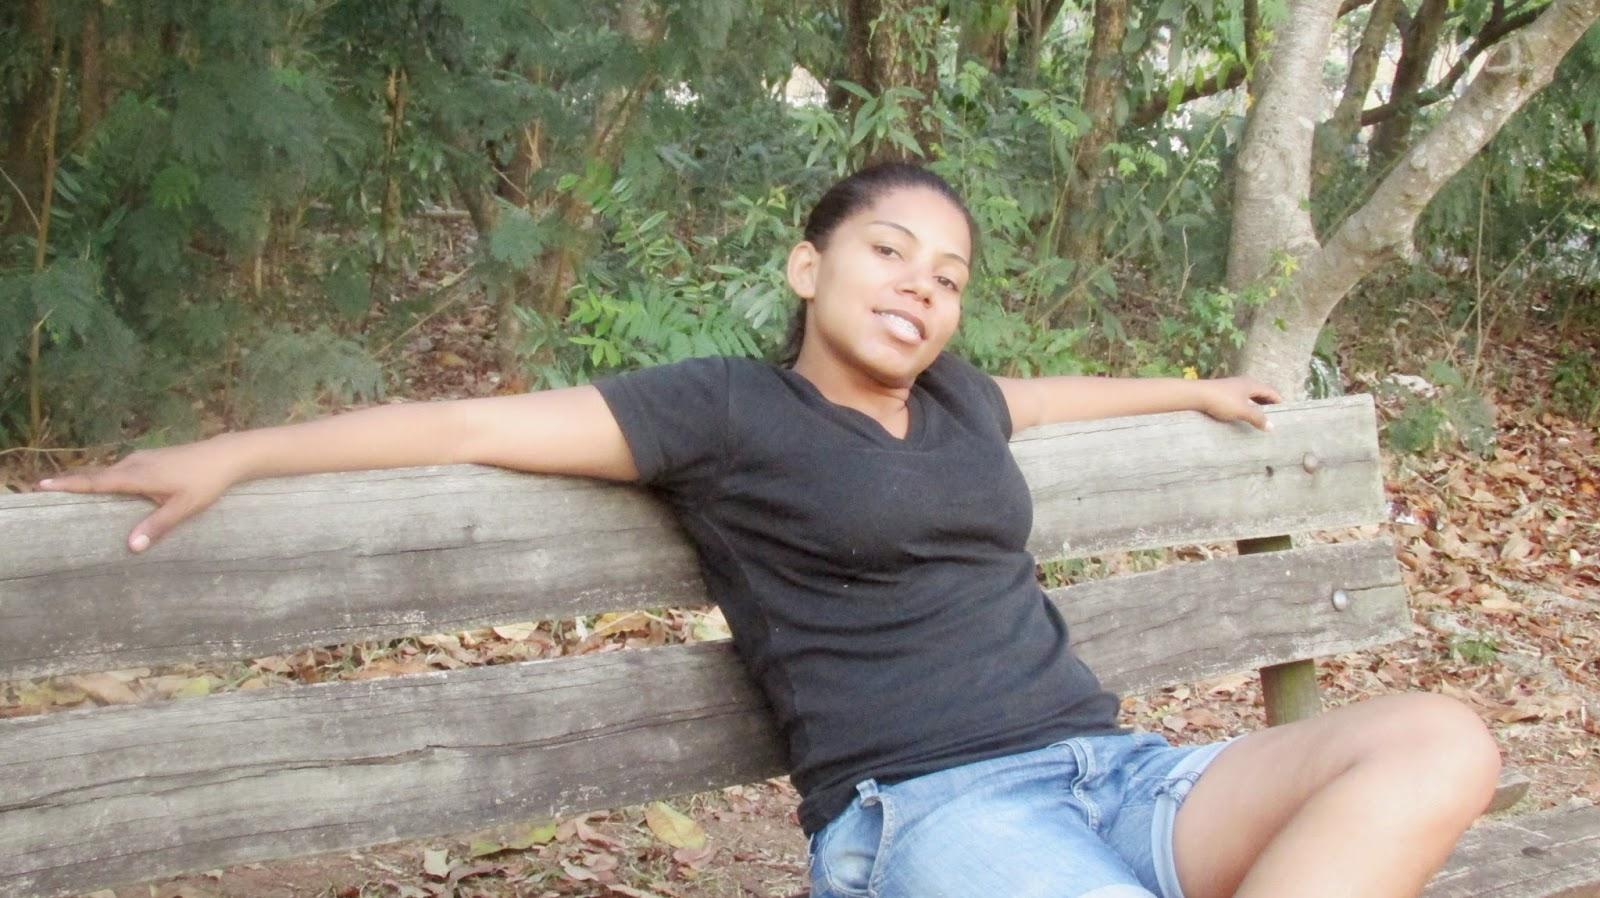 Princesa da China - Parque Villa Lobos